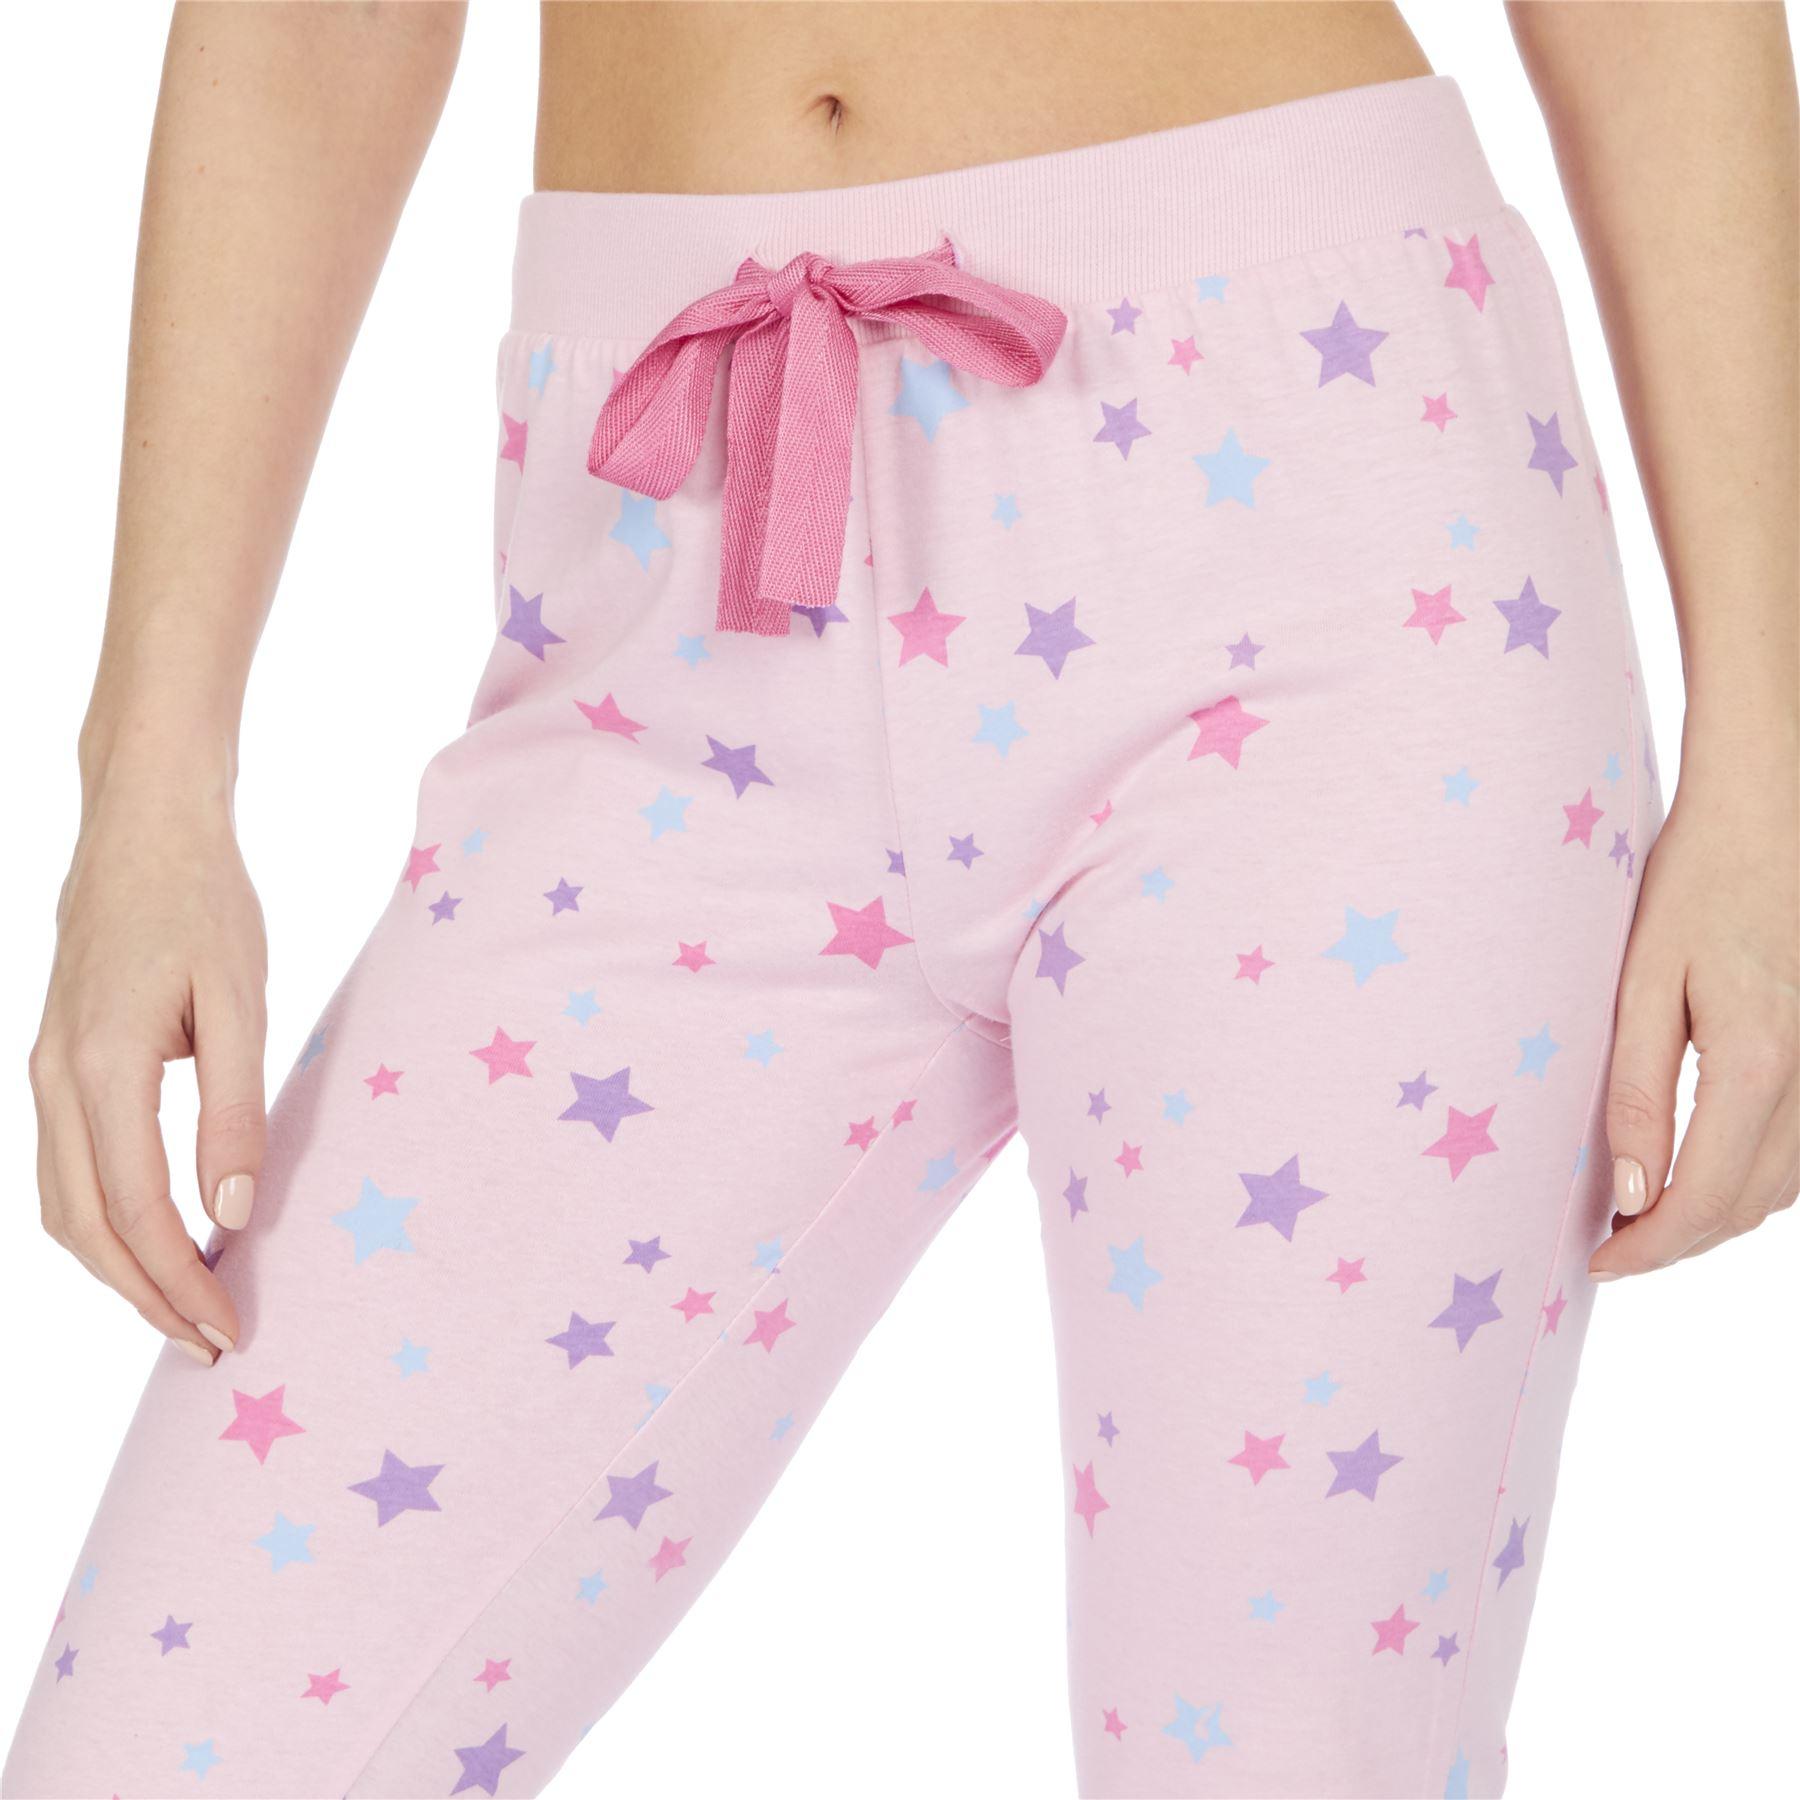 Womens-Ladies-Cotton-Pyjamas-Pyjama-PJs-Summer-Nightwear-Set-Size-8-18-NEW thumbnail 15